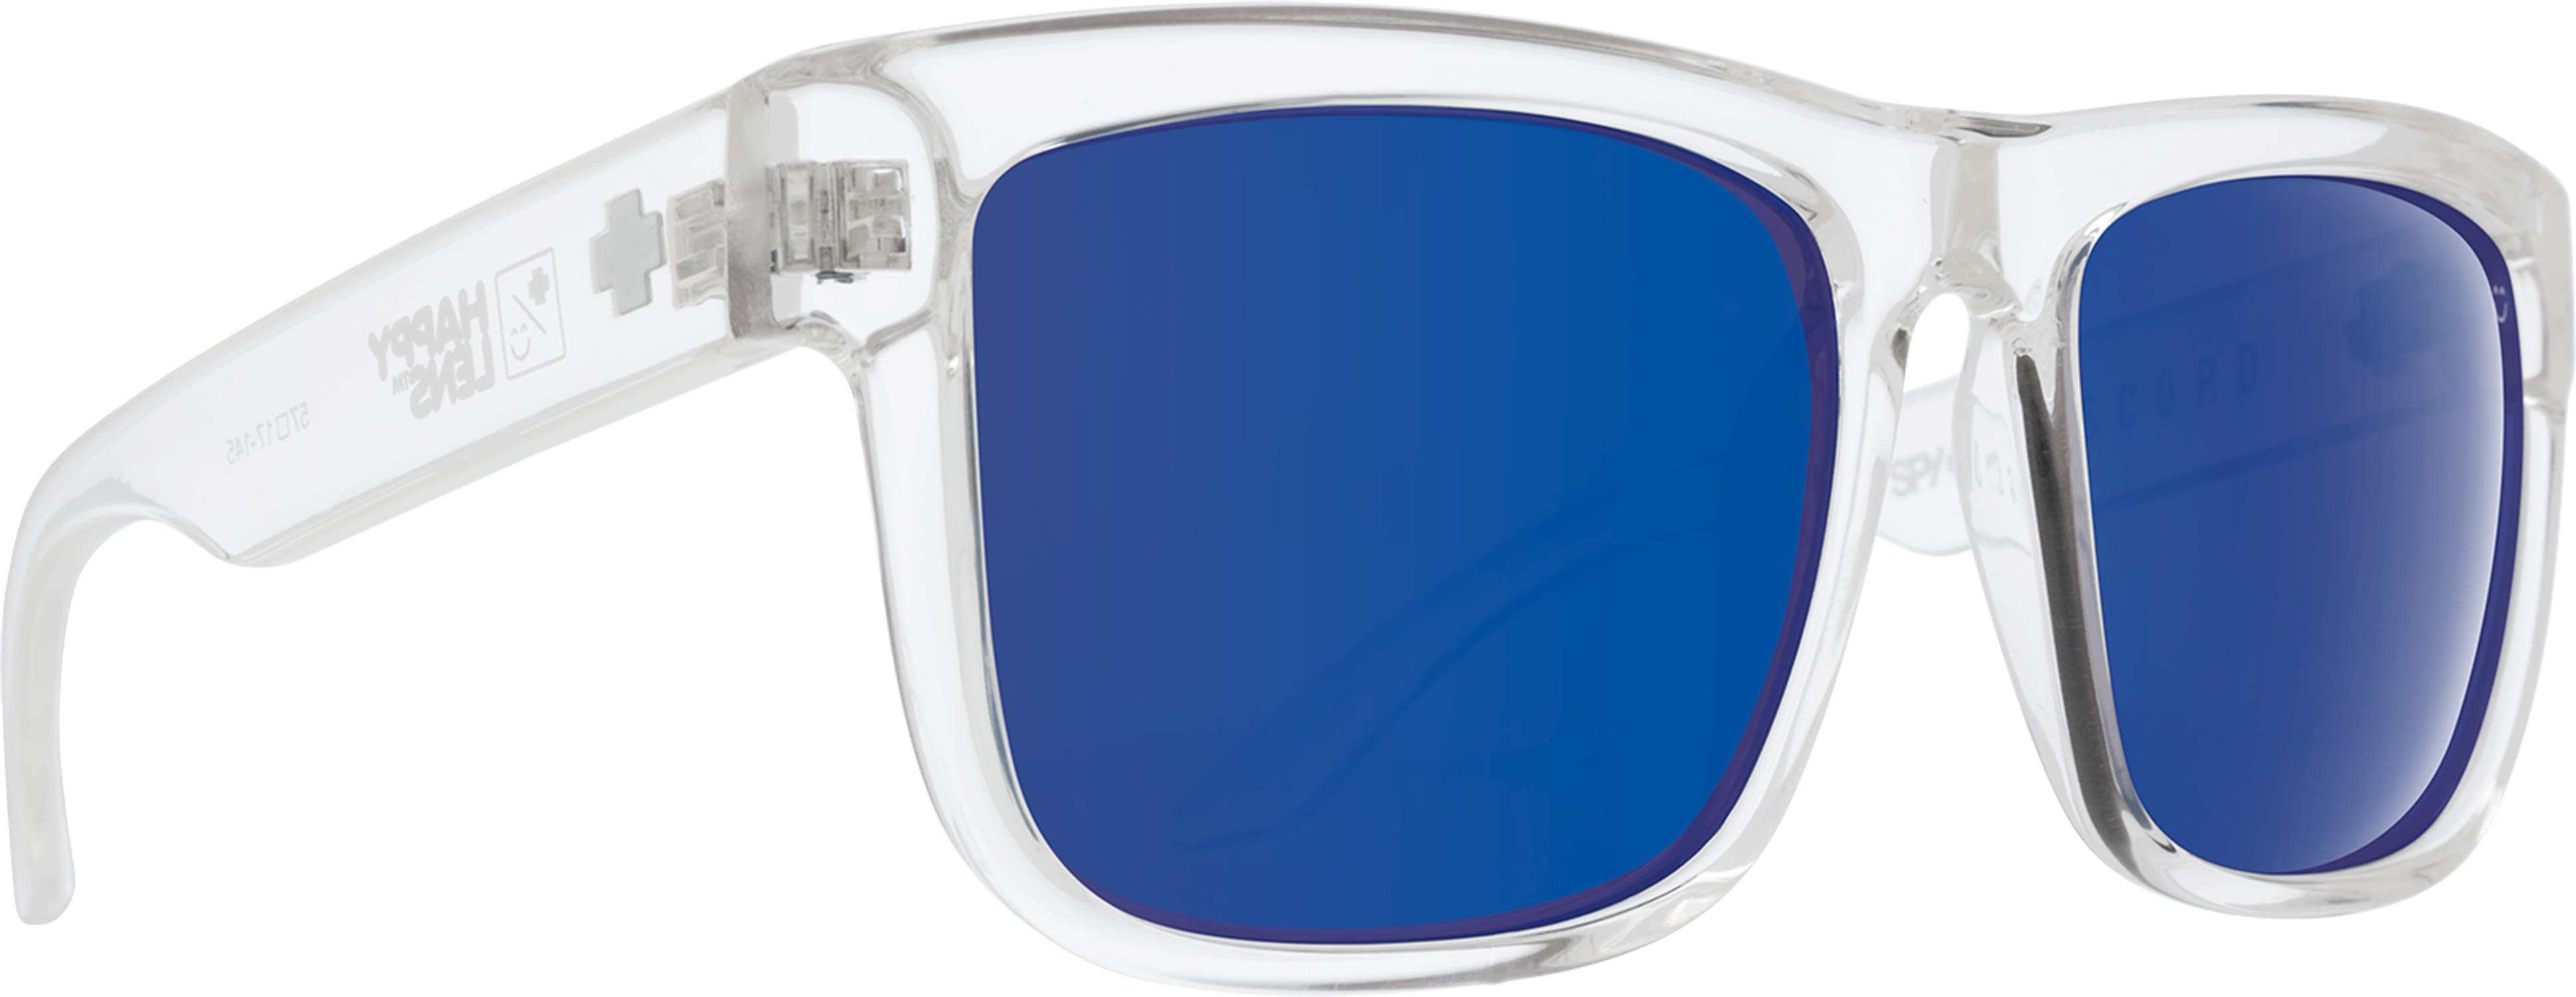 dfc4f9d96359a Spy Discord Sunglasses - thumbnail 1